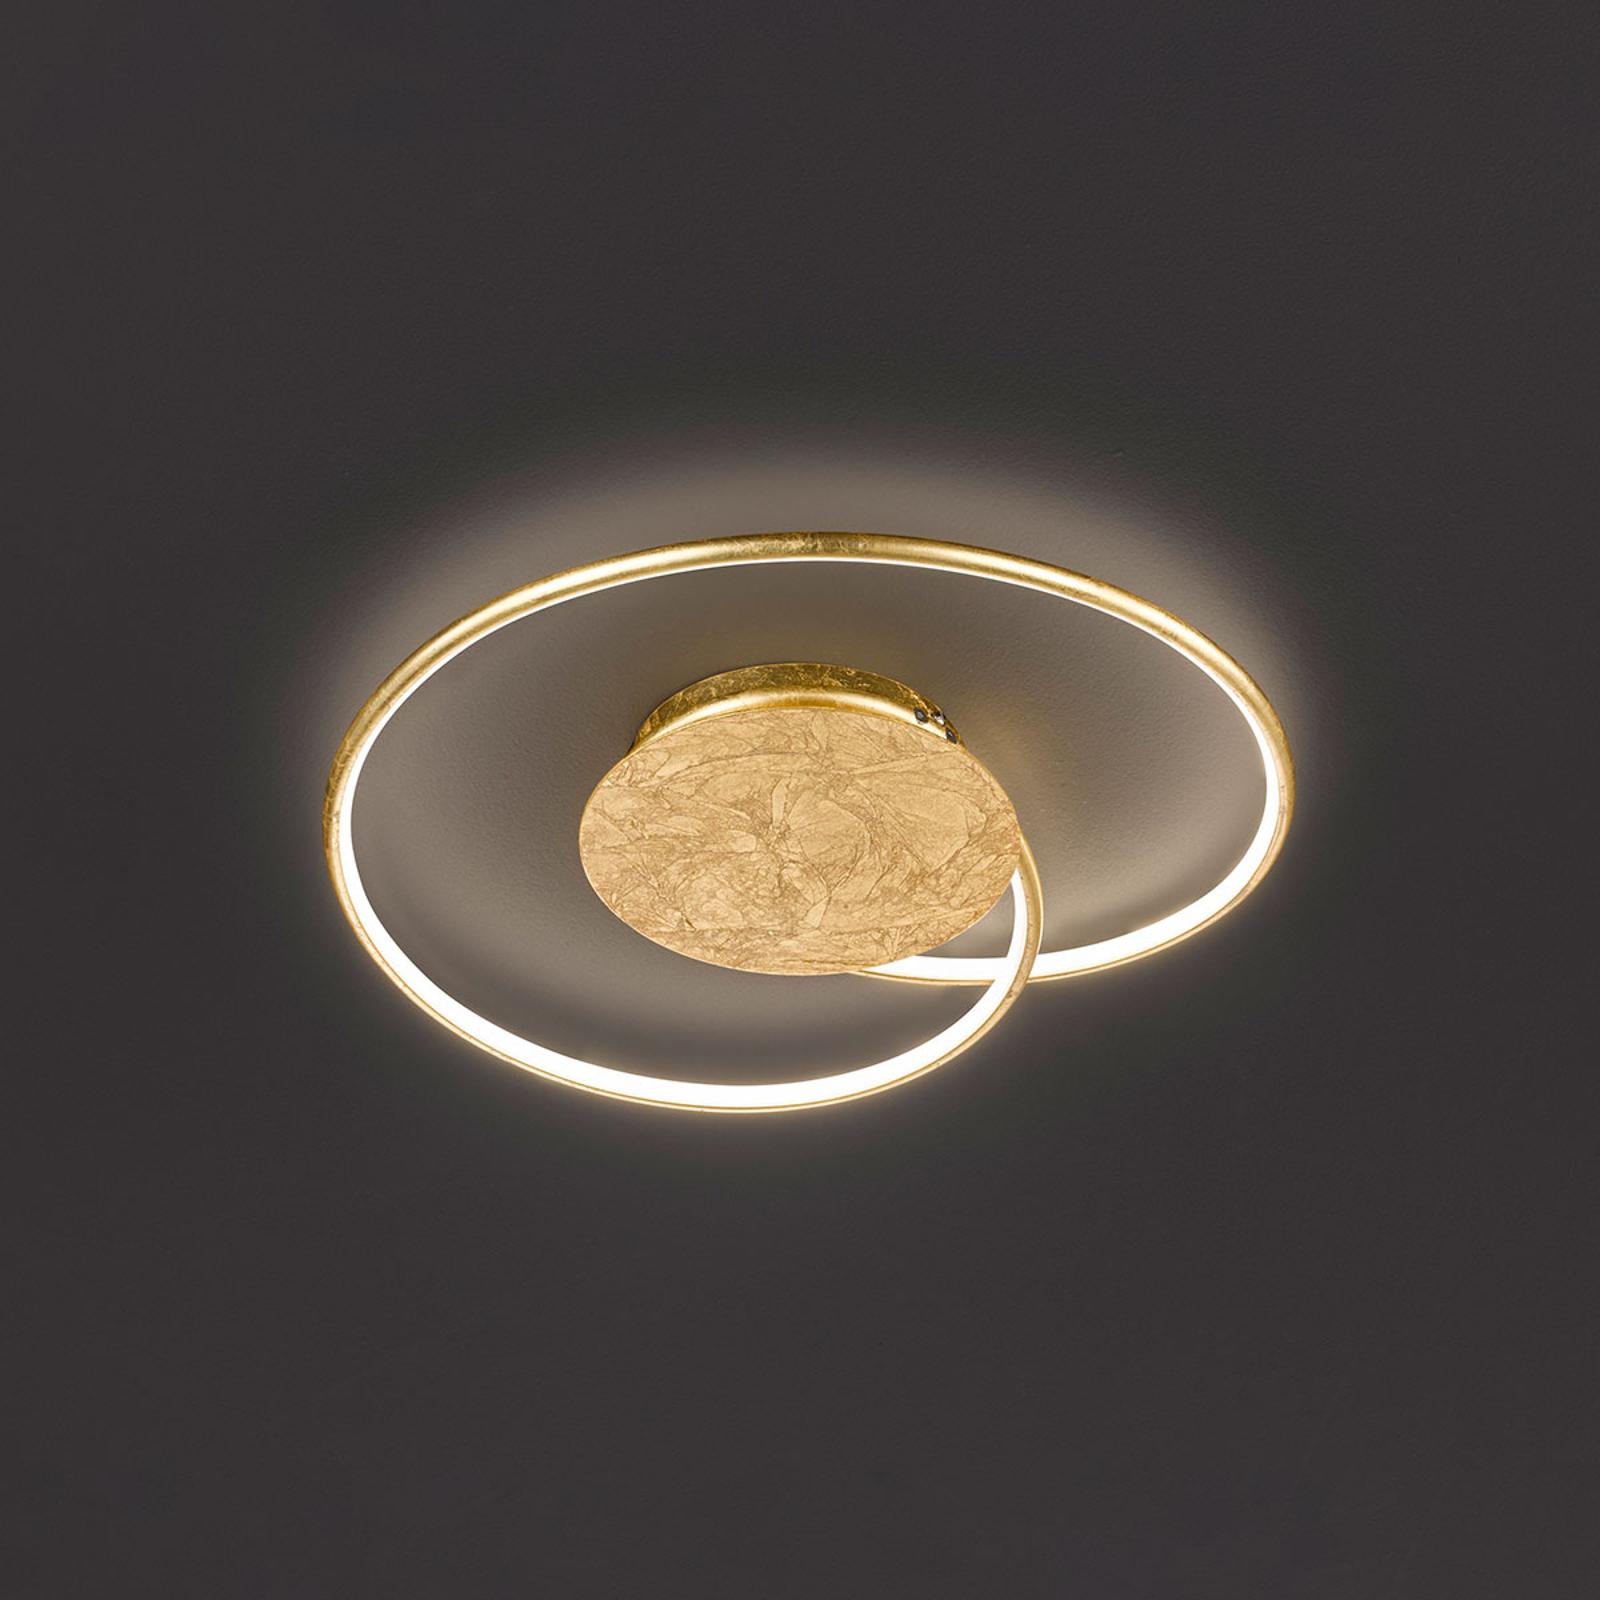 LED plafondlamp Opus, goud, lengte 45 cm